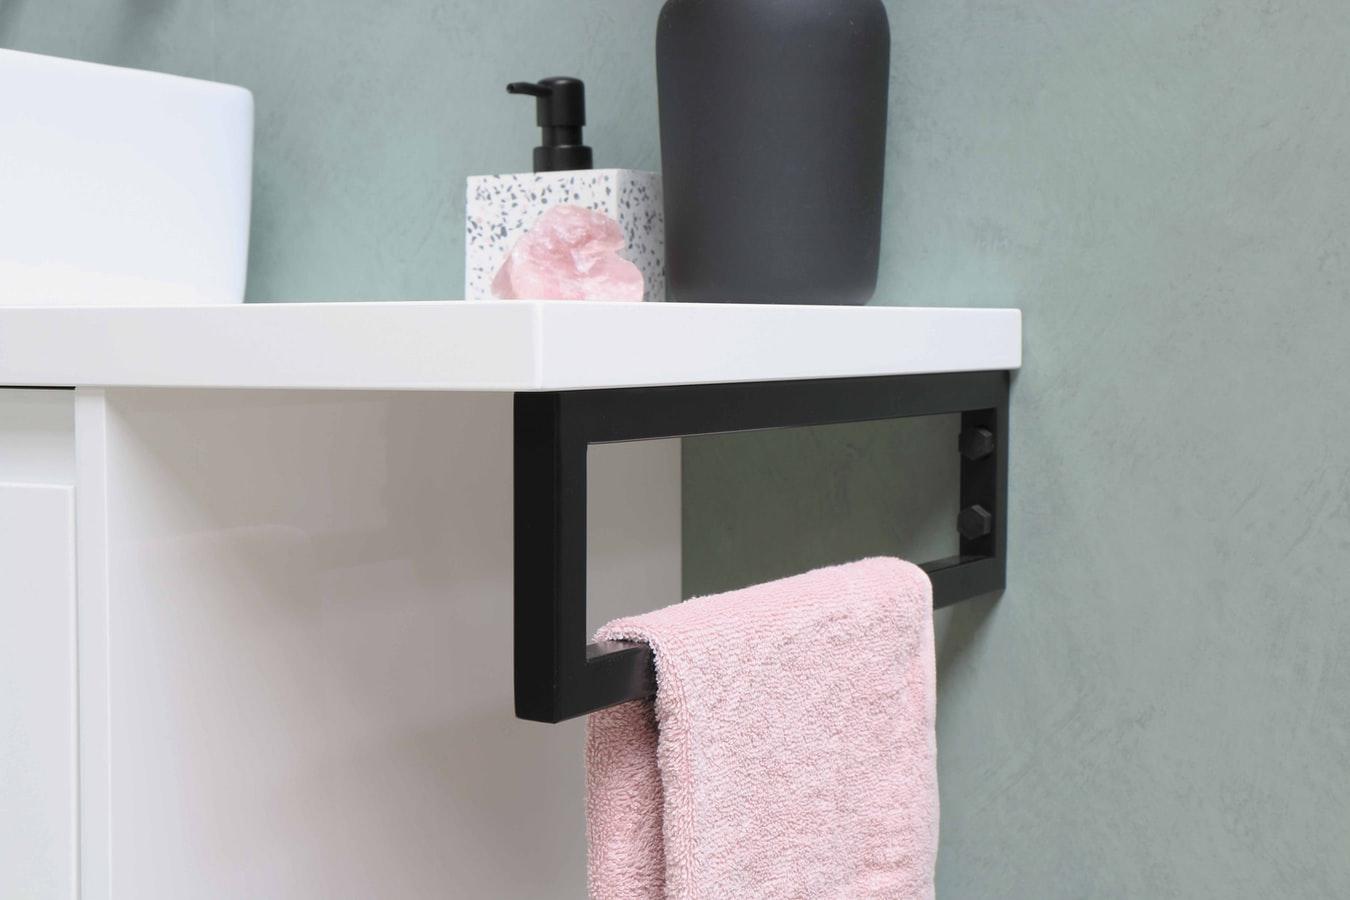 Can a towel warmer catch fire